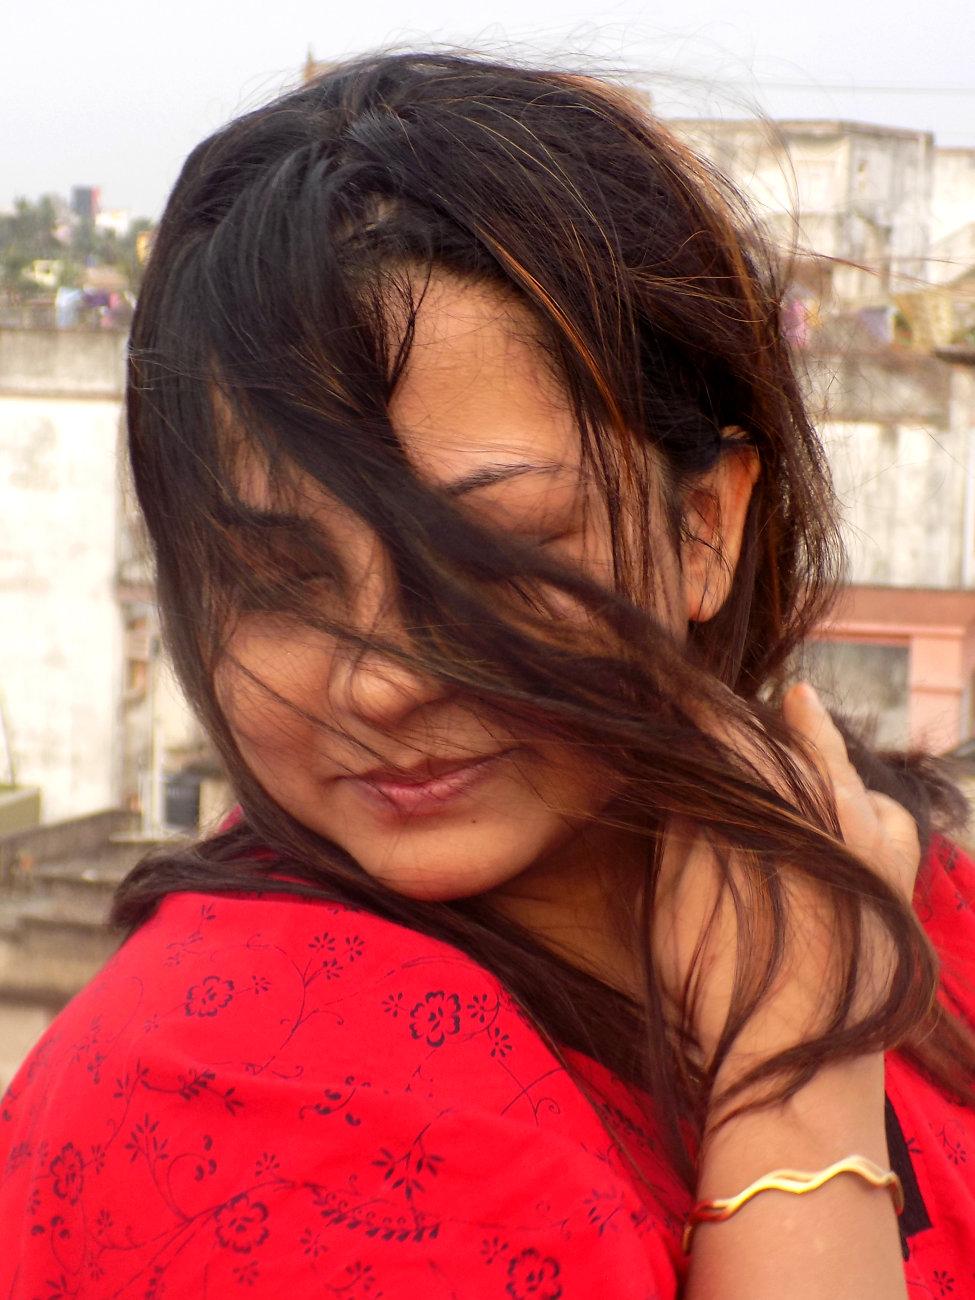 """Careless Beauty"" - A Photograph by Suvajit's Photography"